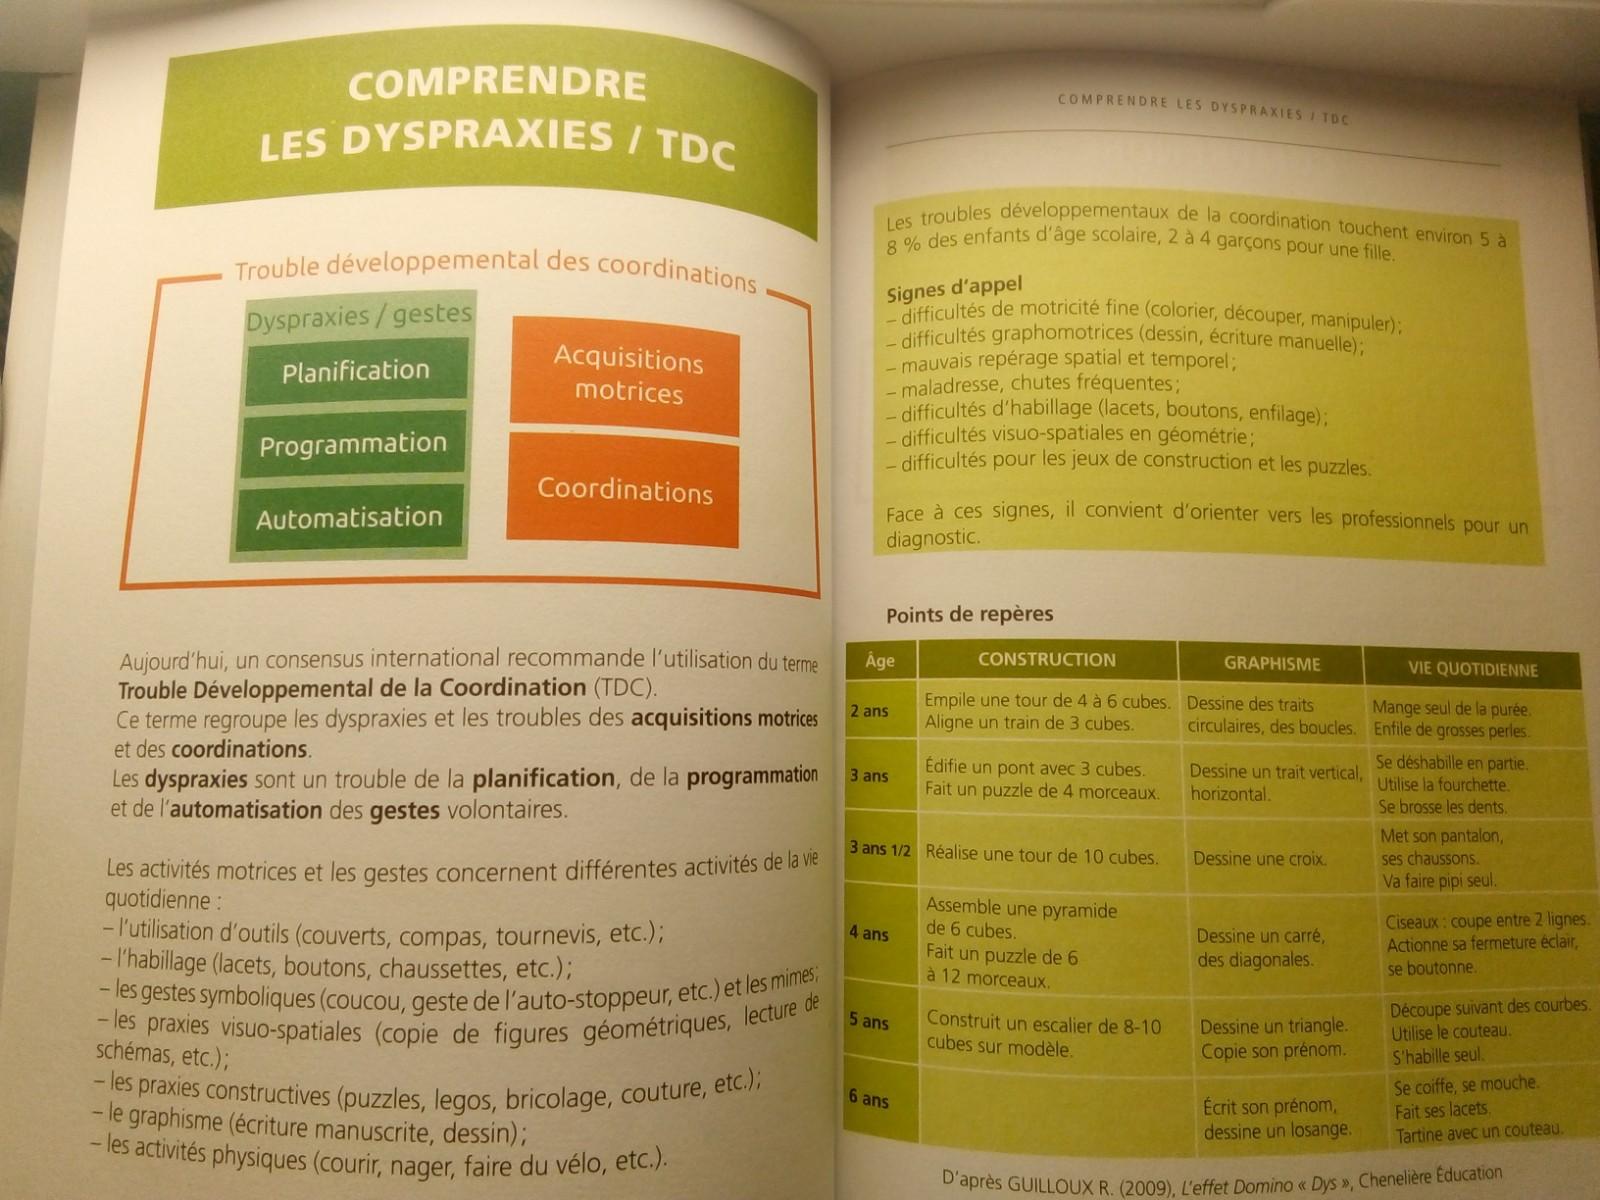 Neuropsychologie stratégies d'apprentissage